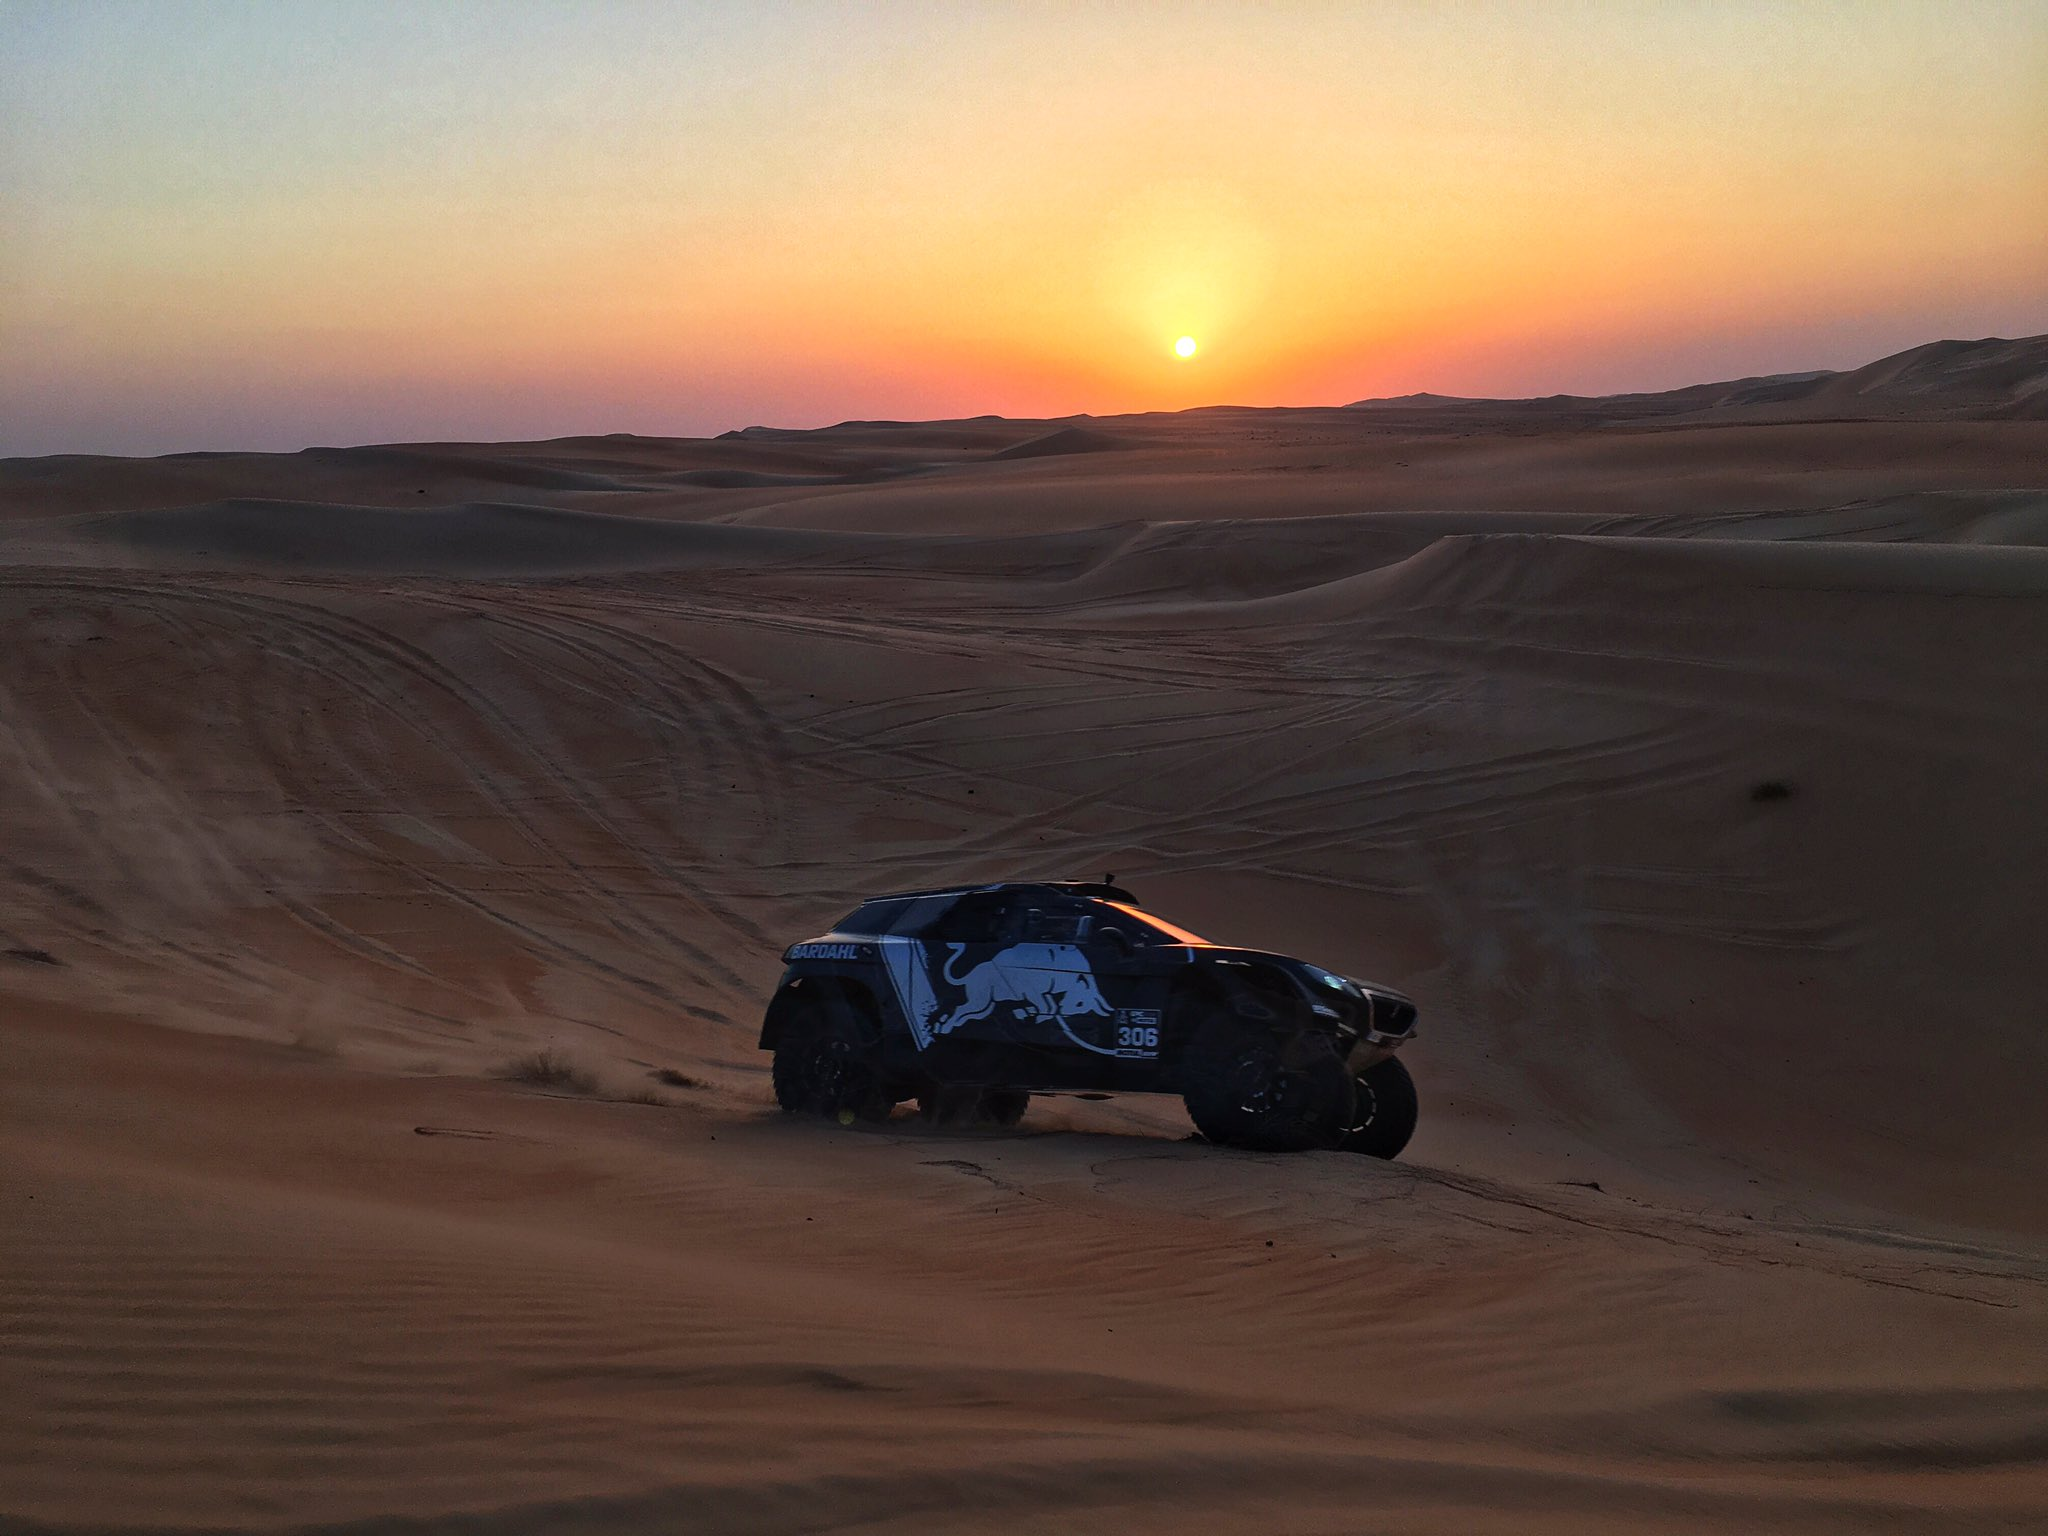 2019 41º Rallye Raid Dakar - Perú [6-17 Enero] - Página 2 DuJfUr6WsAA7zb1